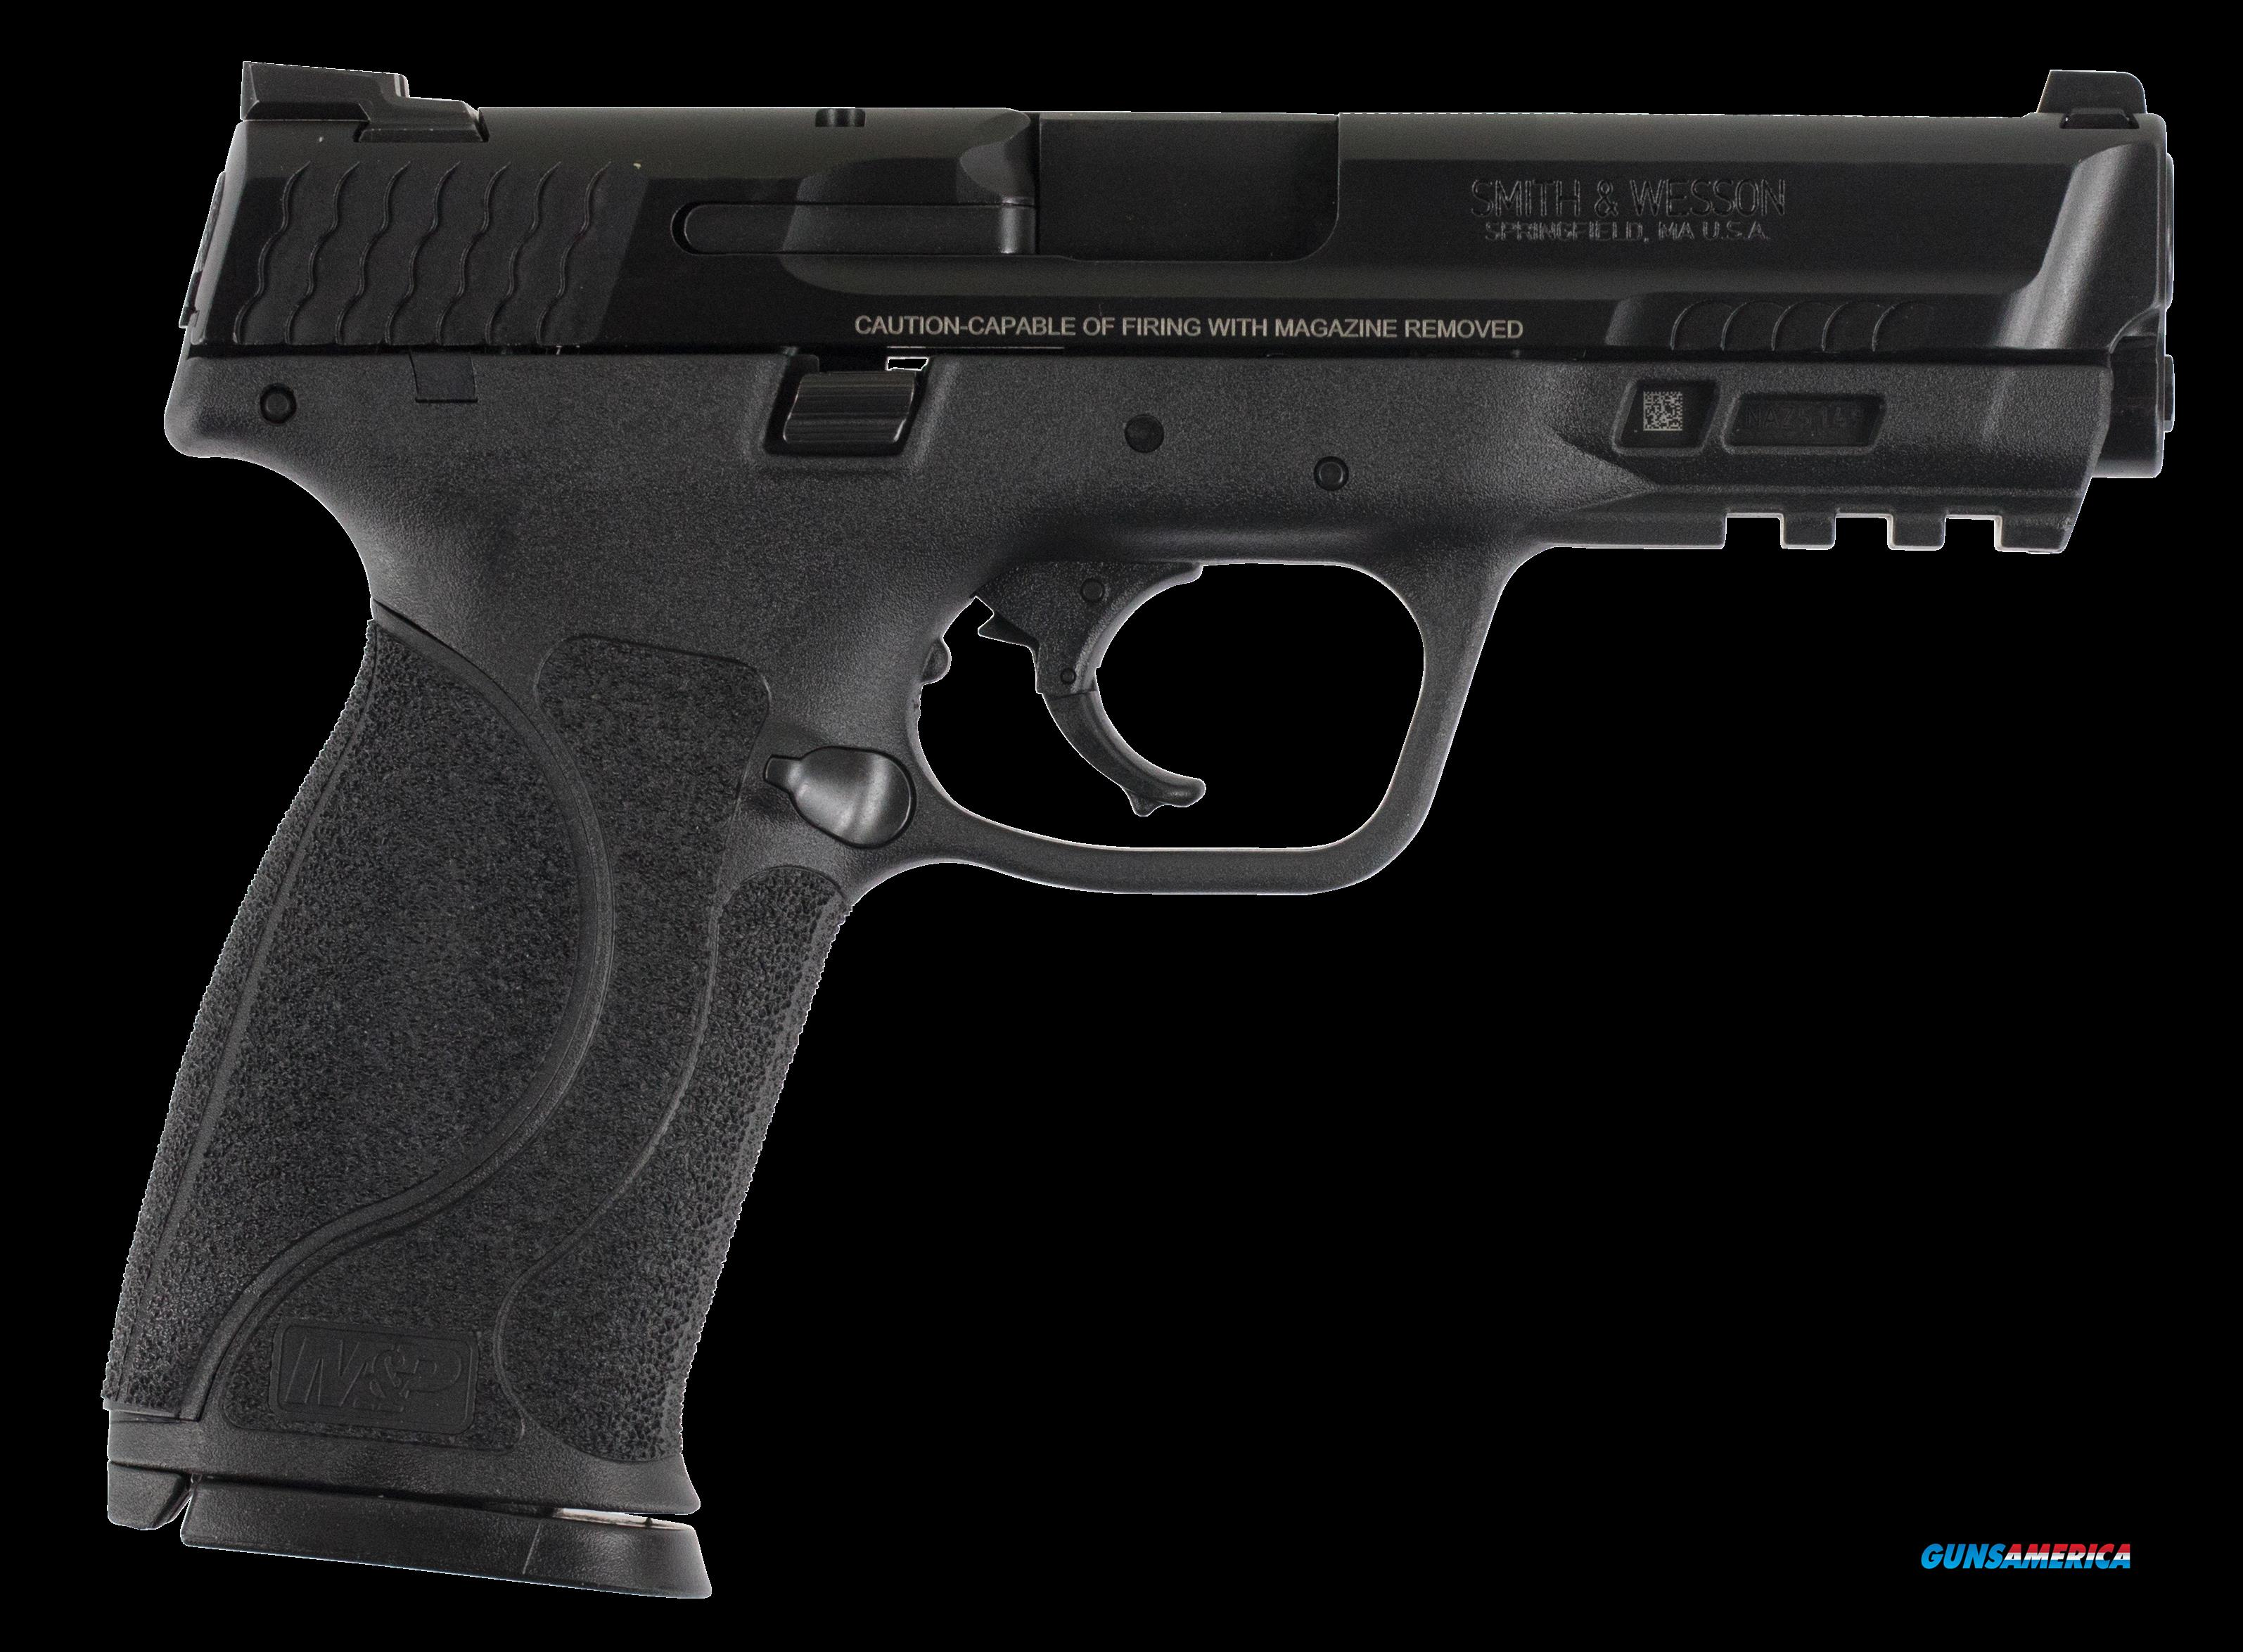 Smith & Wesson M&p 40, S&w M&p40     11762   40 4.25 M2.0 Nts        10r  Guns > Pistols > 1911 Pistol Copies (non-Colt)